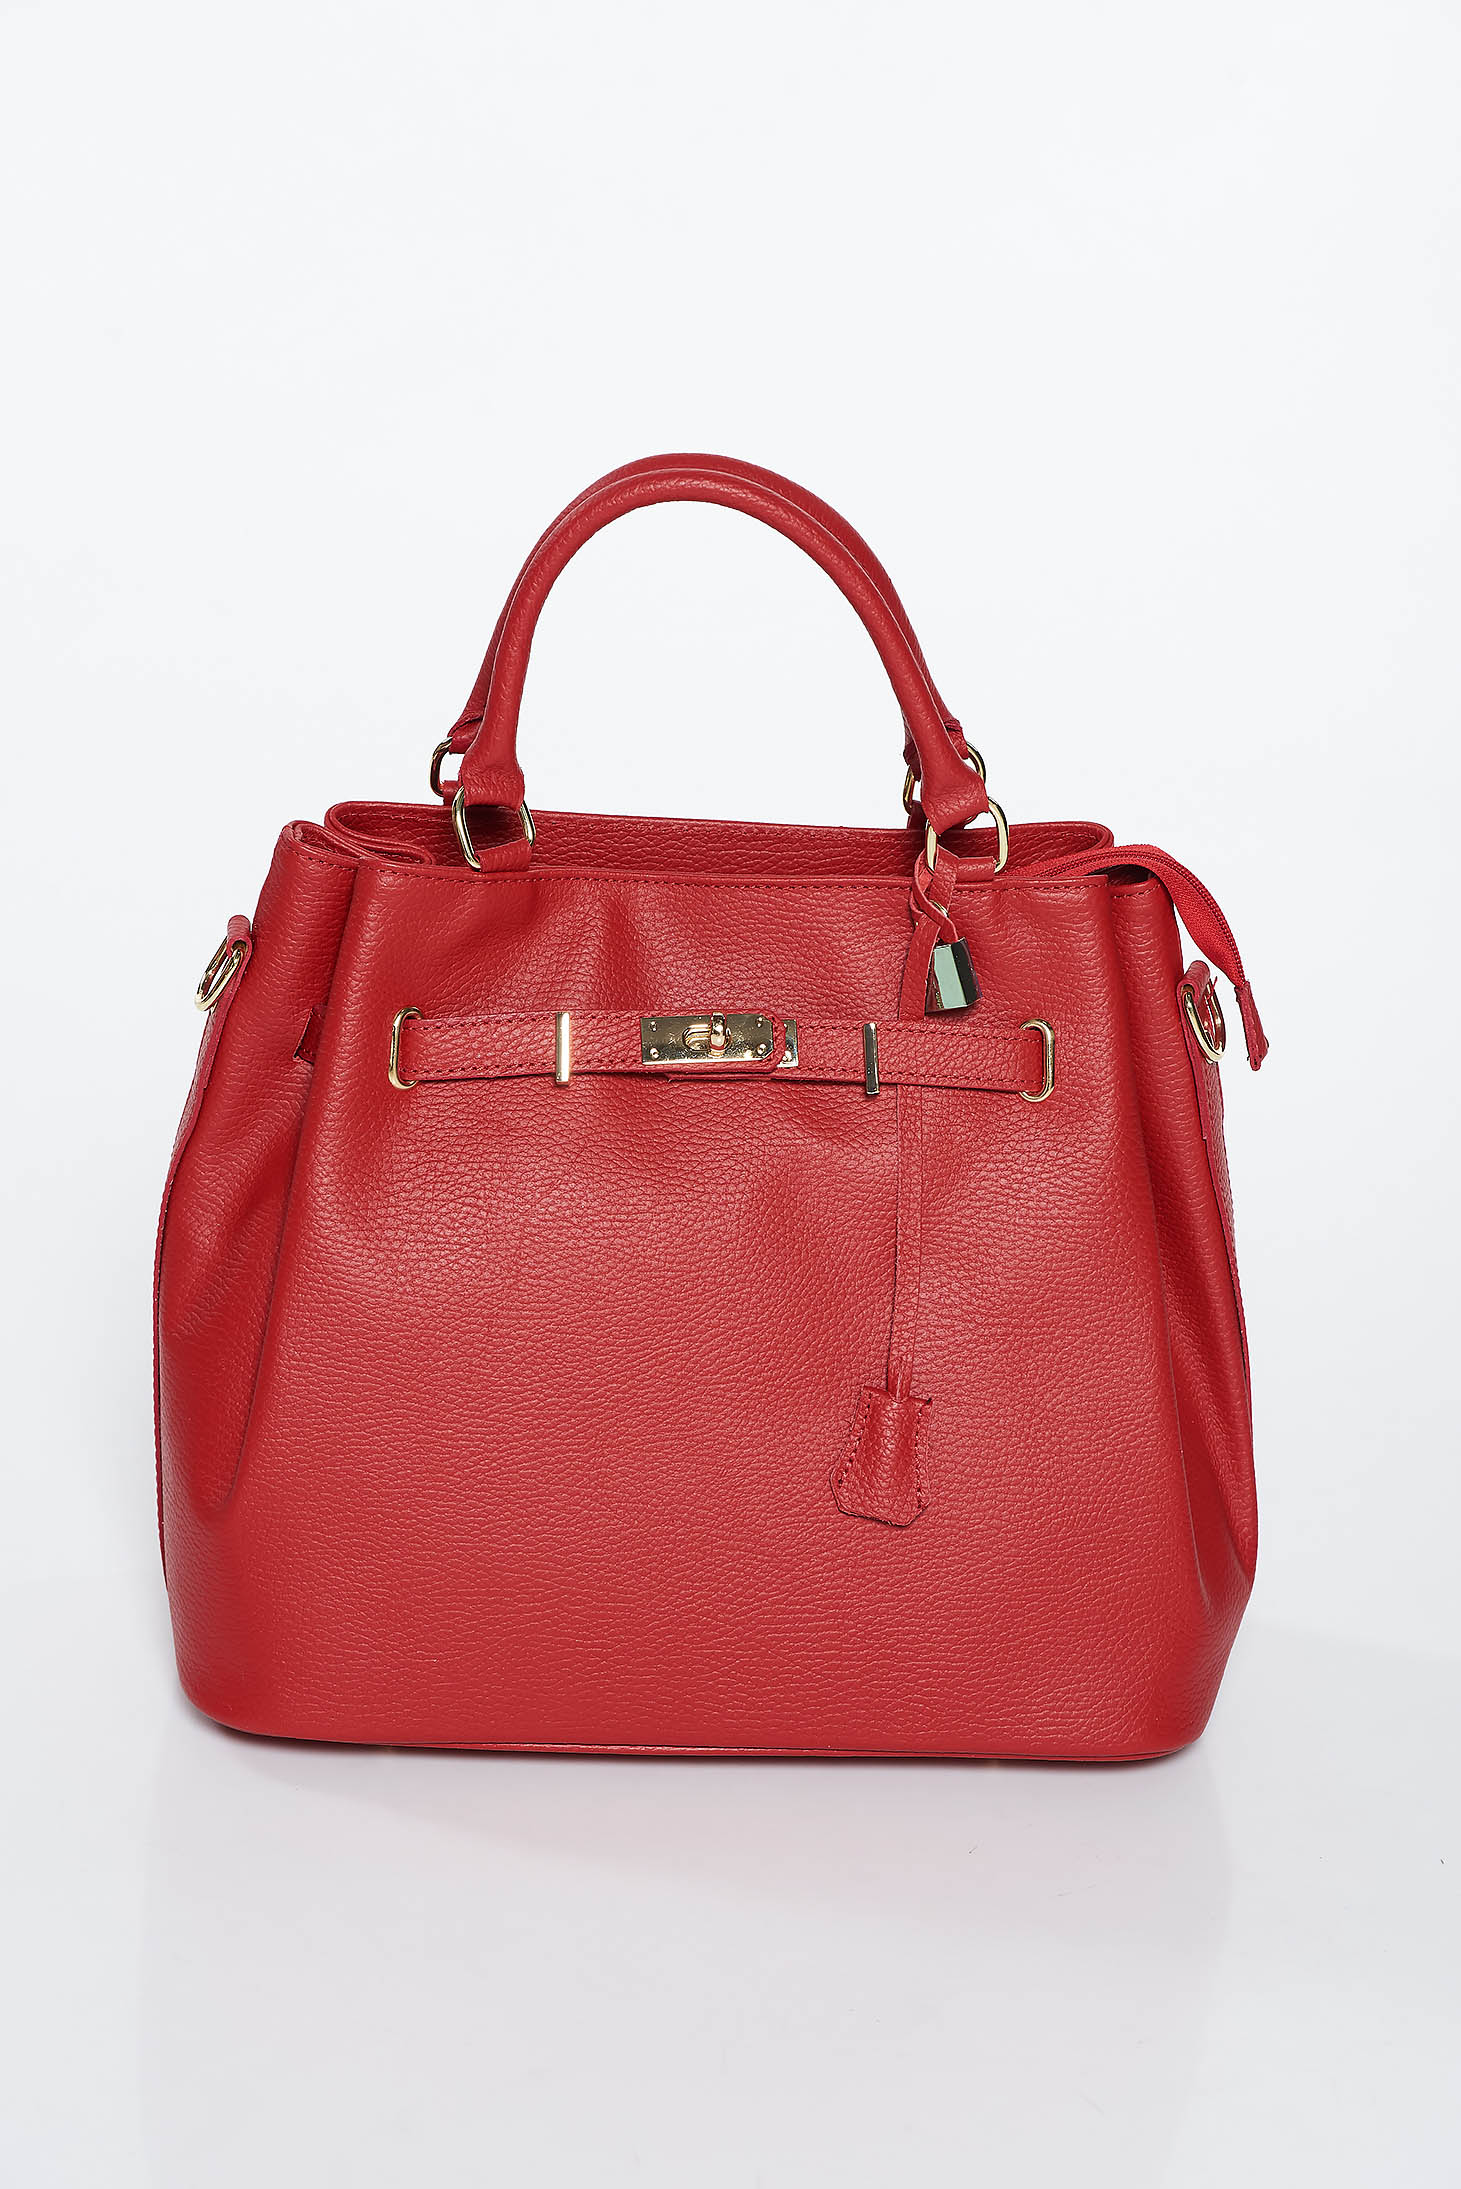 Burgundy office bag short grab handles and single long detachable handle